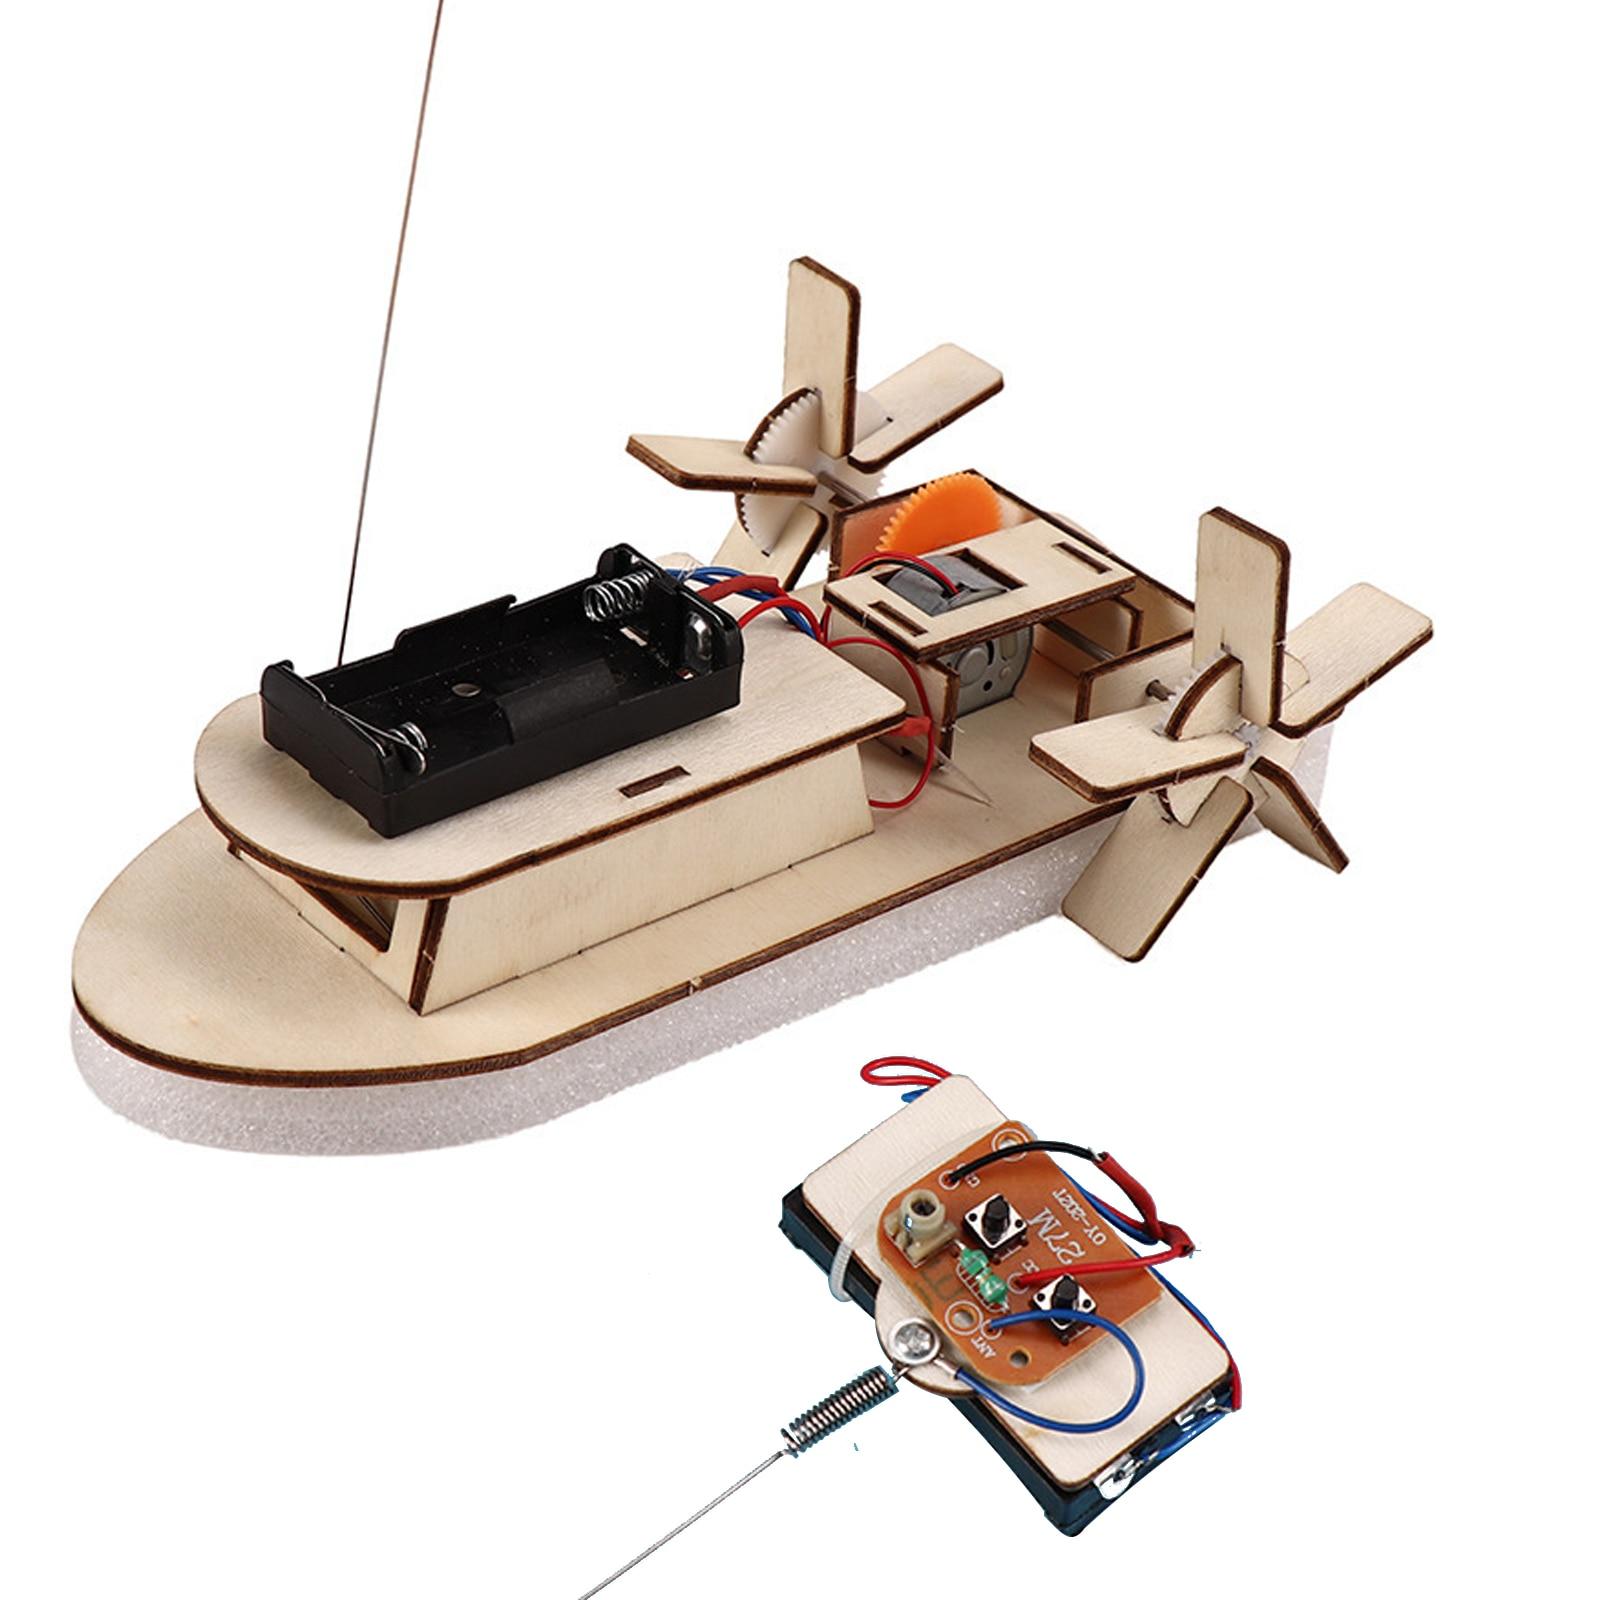 Students DIY Paddle Wheel RC Boat Ship Assembling Model Remote Control Educational Toys Material Kit